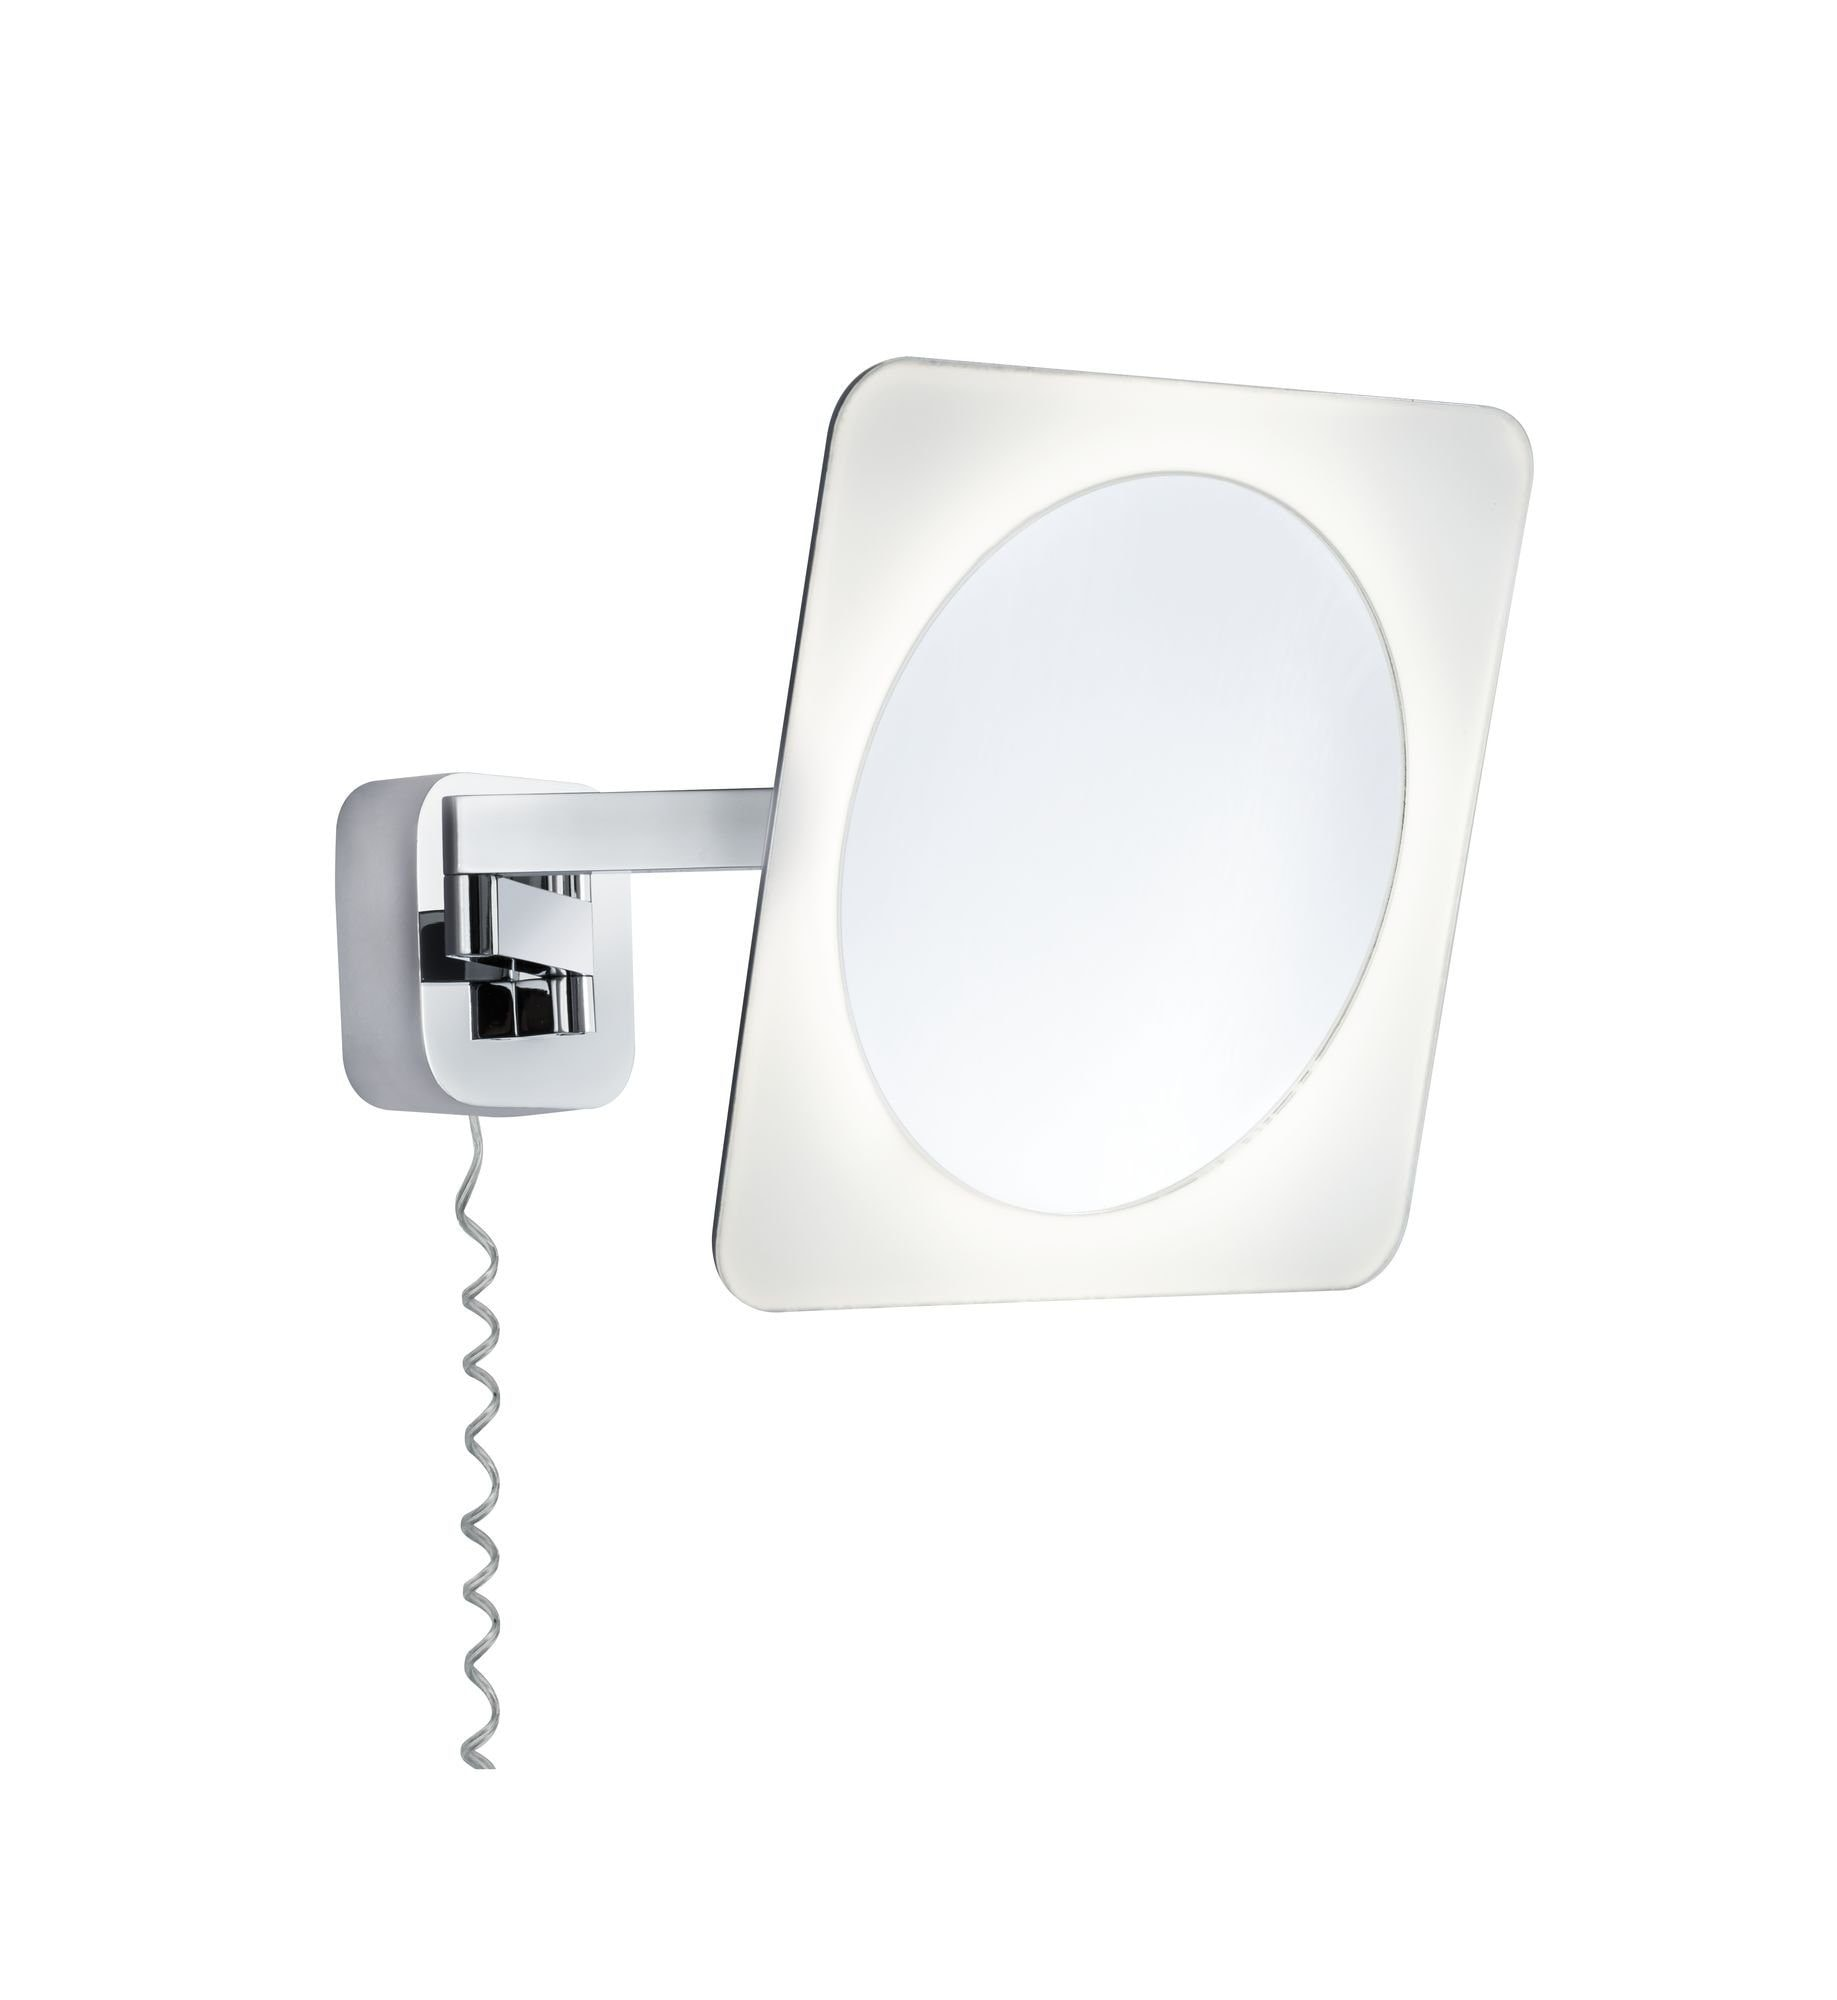 Paulmann,LED Wandleuchte Kosmetikspiegel Bela 5,7W Chrom Weiß Spiegel Metall